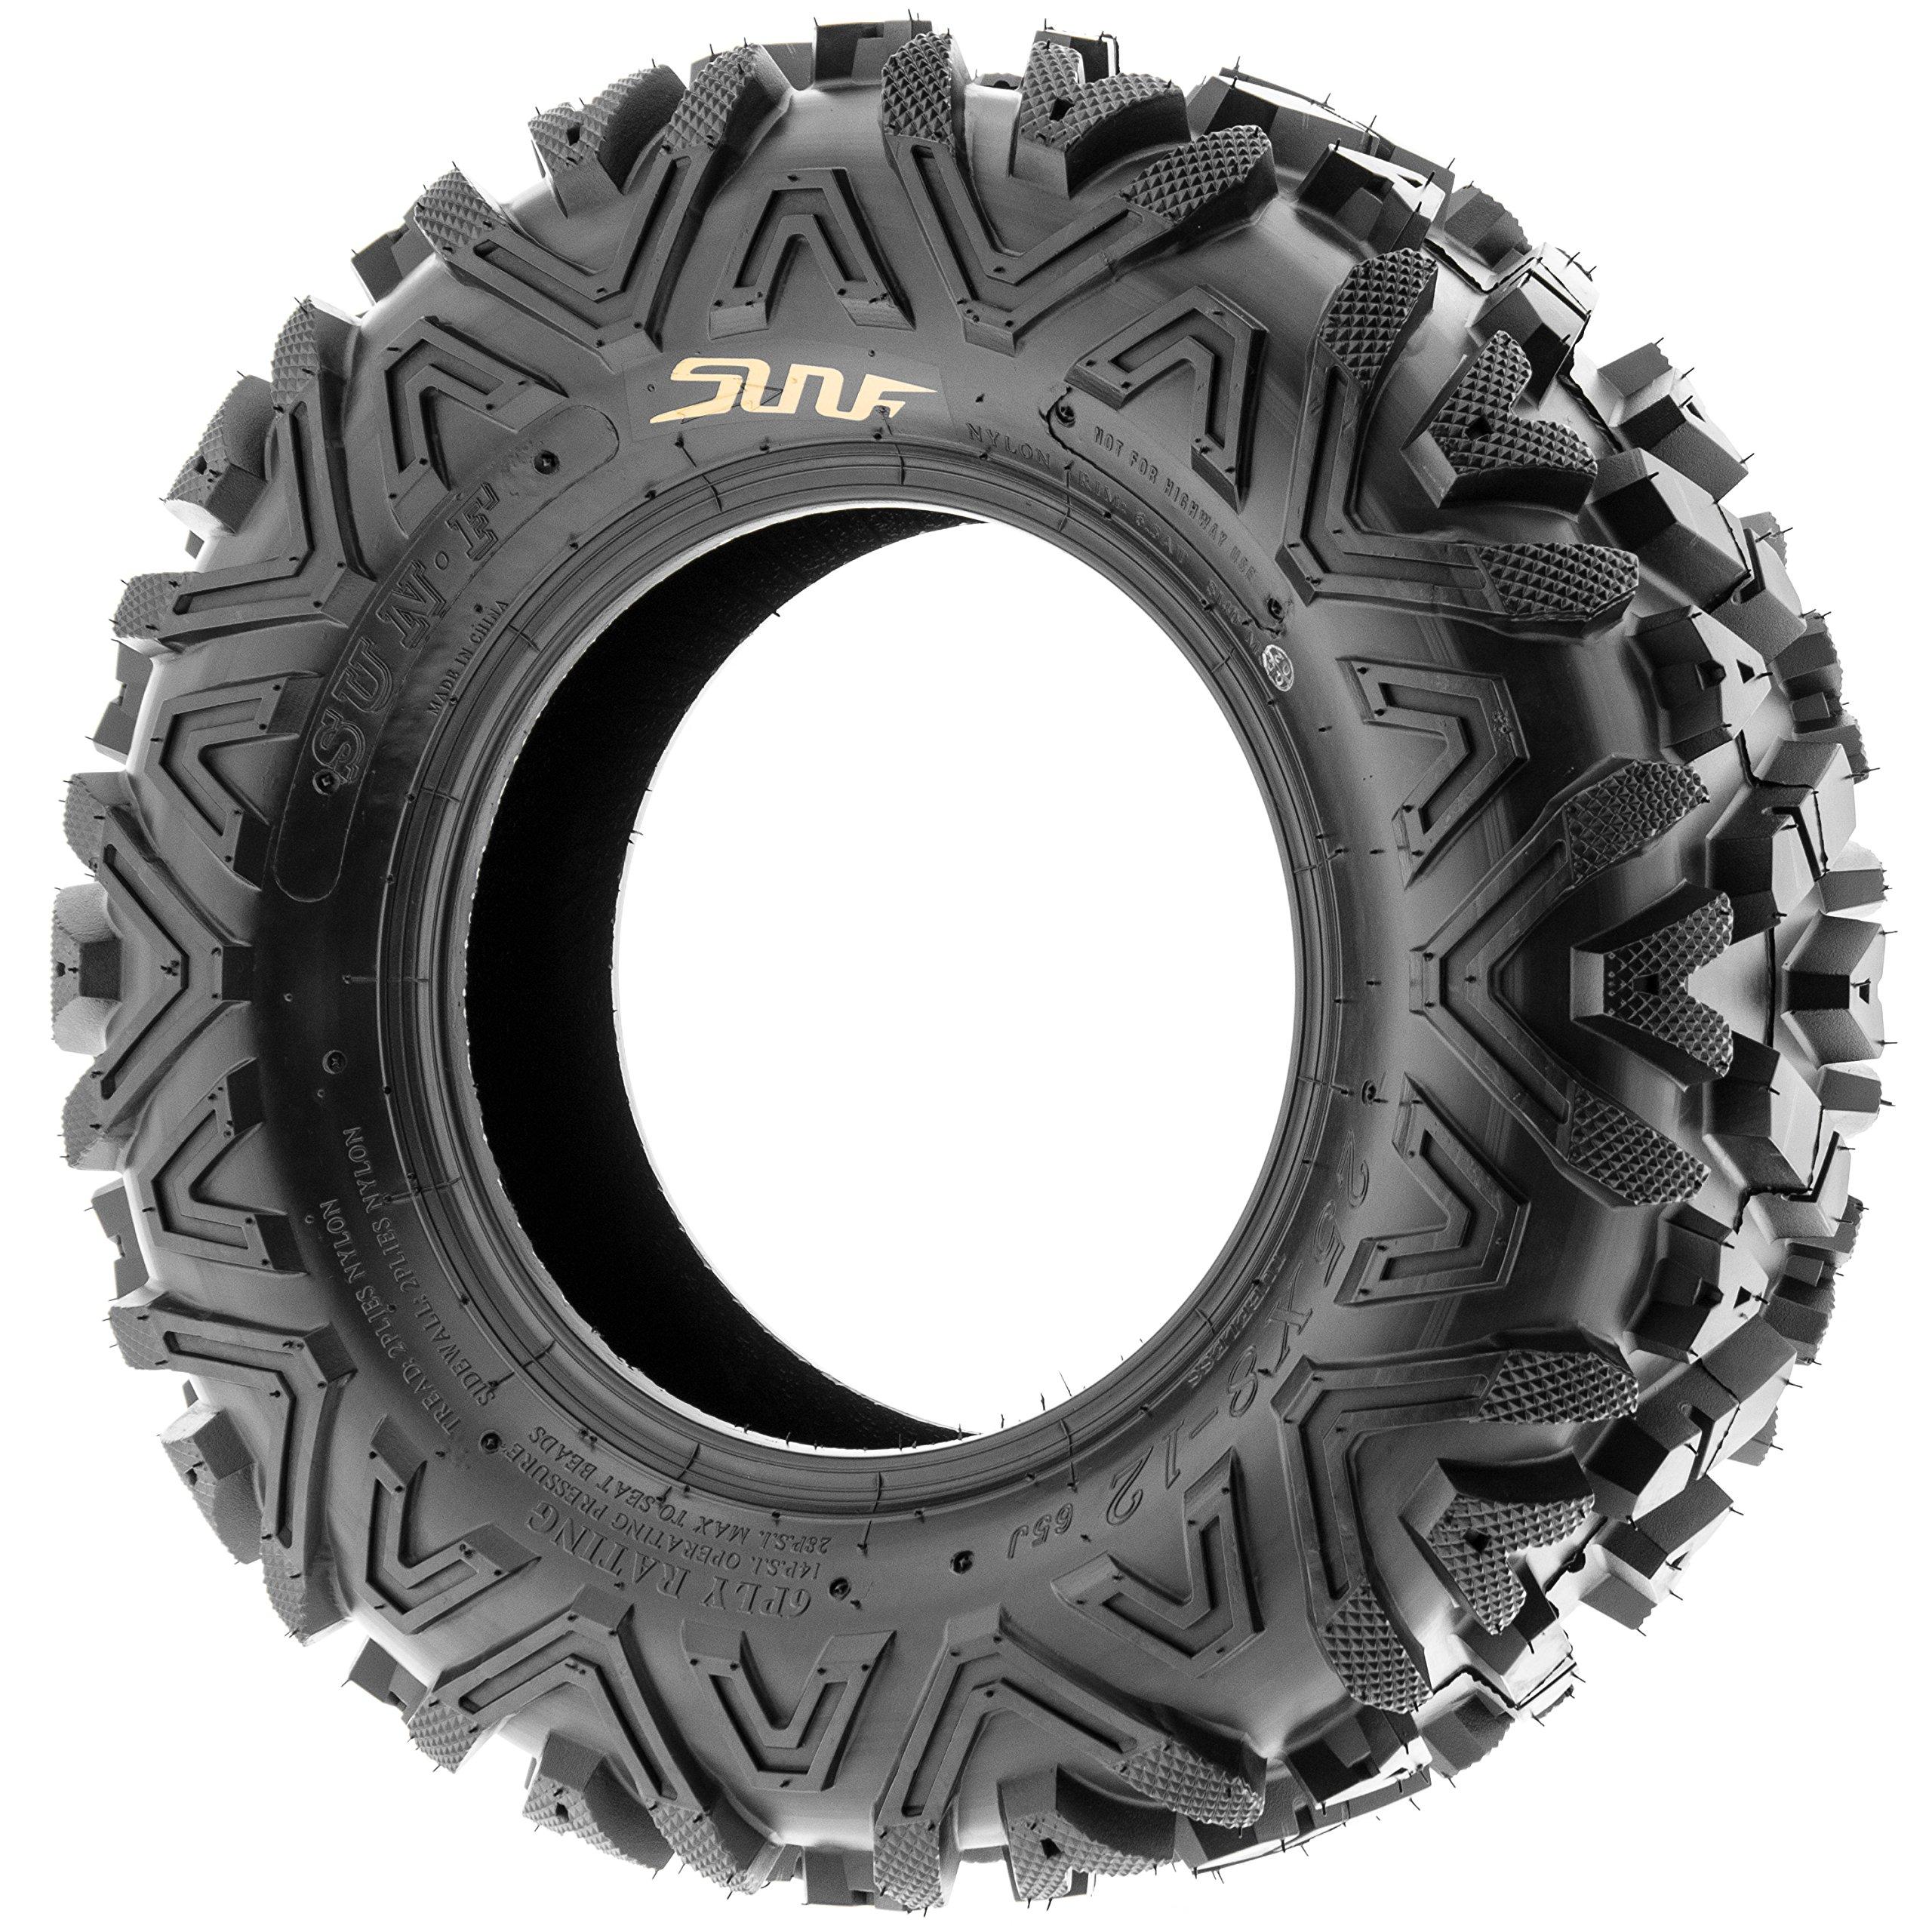 SunF A033 ATV/UTV Tire 28x9-12 Front & 28x11-12 Rear, Set of 4 by SunF (Image #2)